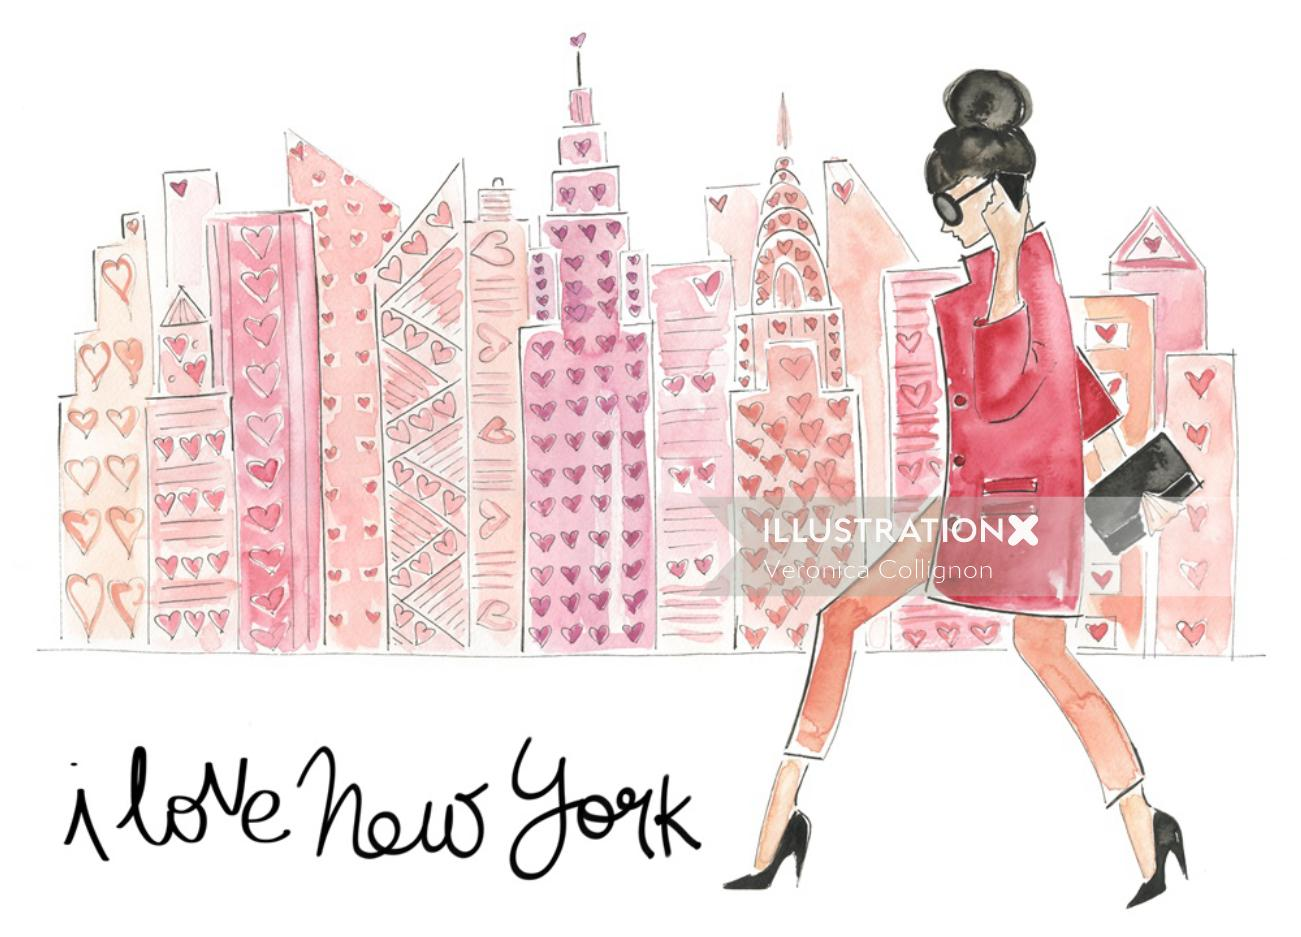 New York fashion woman illustration by Veronica Collignon